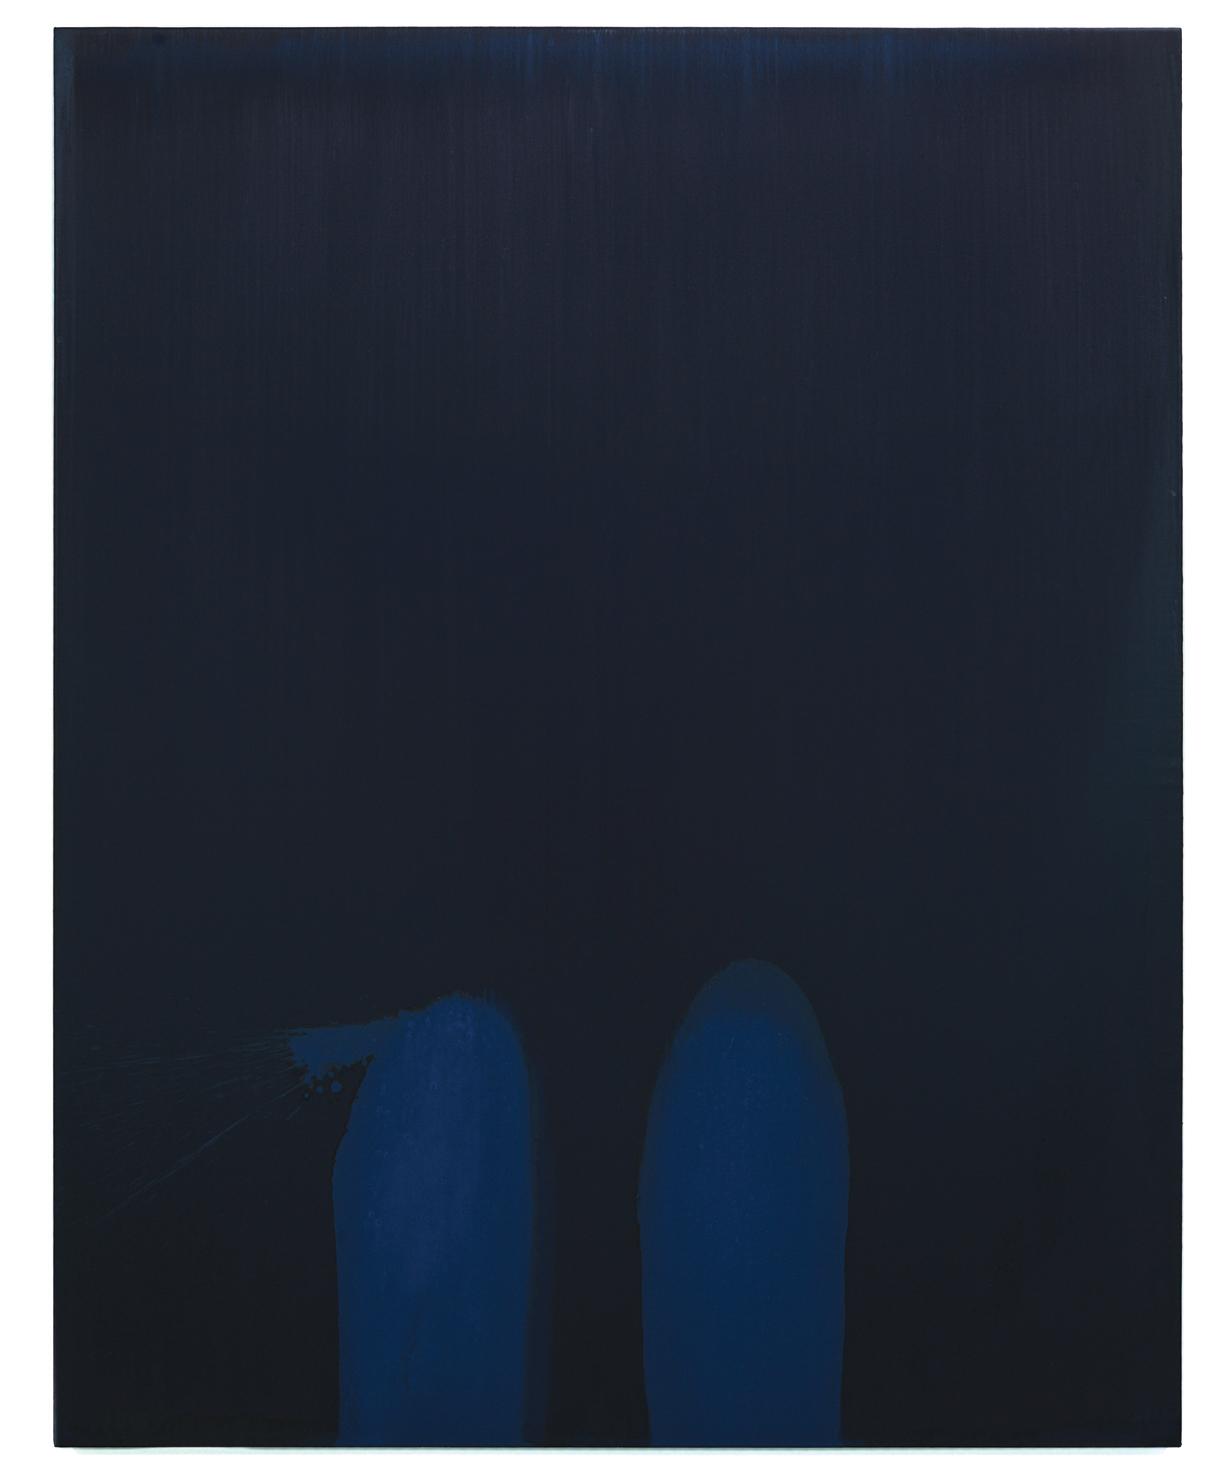 Luke HENG Blue on Blue no.2 2015 Oil on linen H170 x W135 x D5 cm